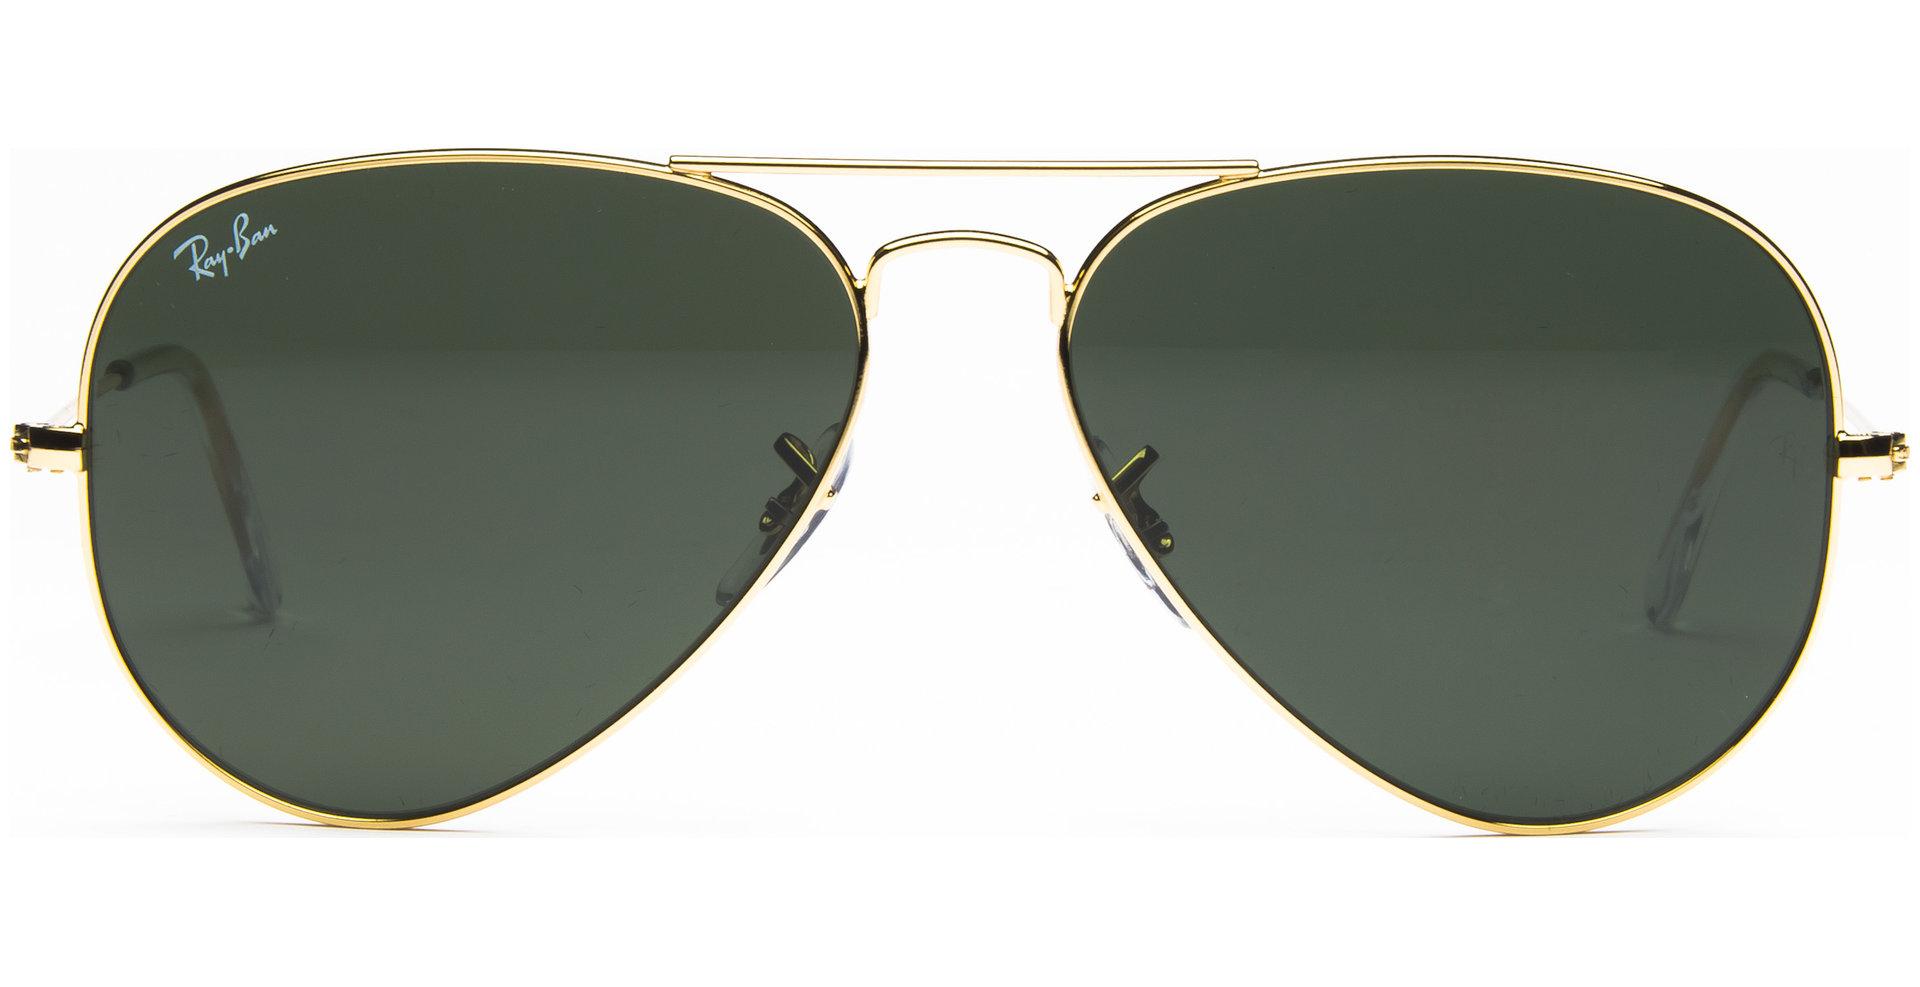 08d909c60e Ray-Ban - Aviator Large Metal RB3025 L0205 5814 Arista Crystal Green - von